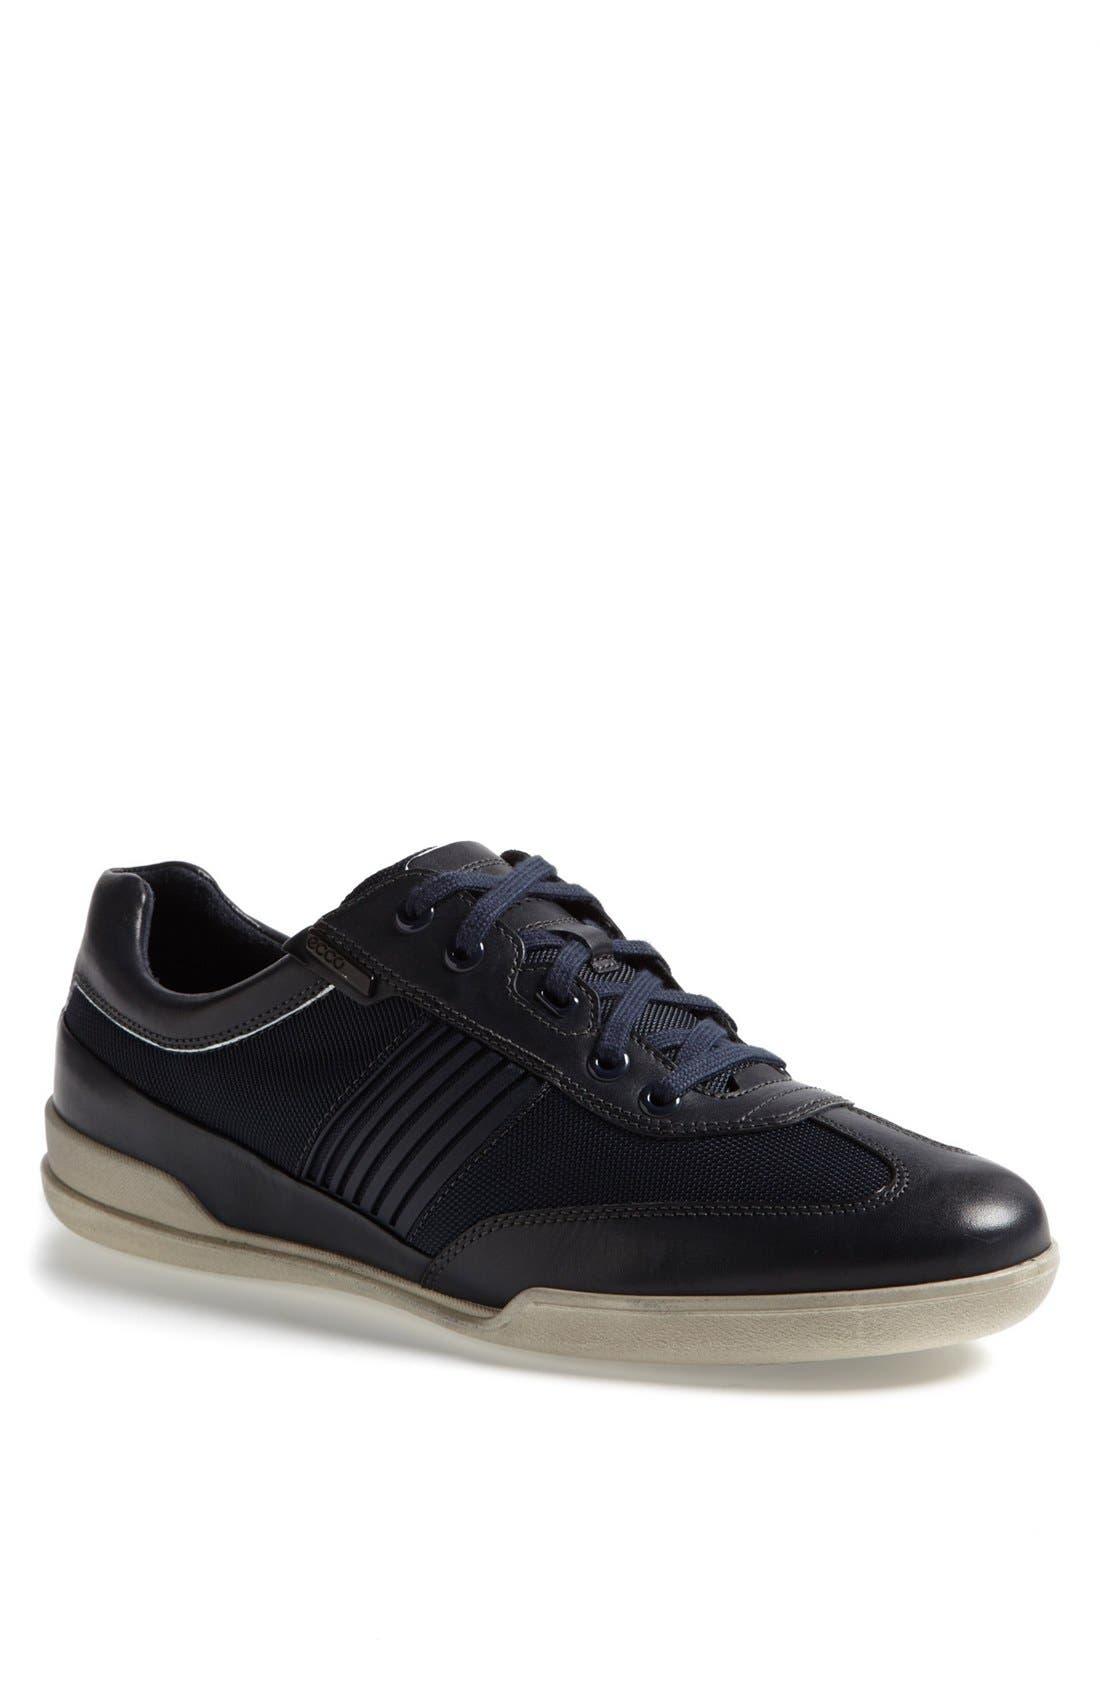 Alternate Image 1 Selected - ECCO 'Enrico' Sneaker